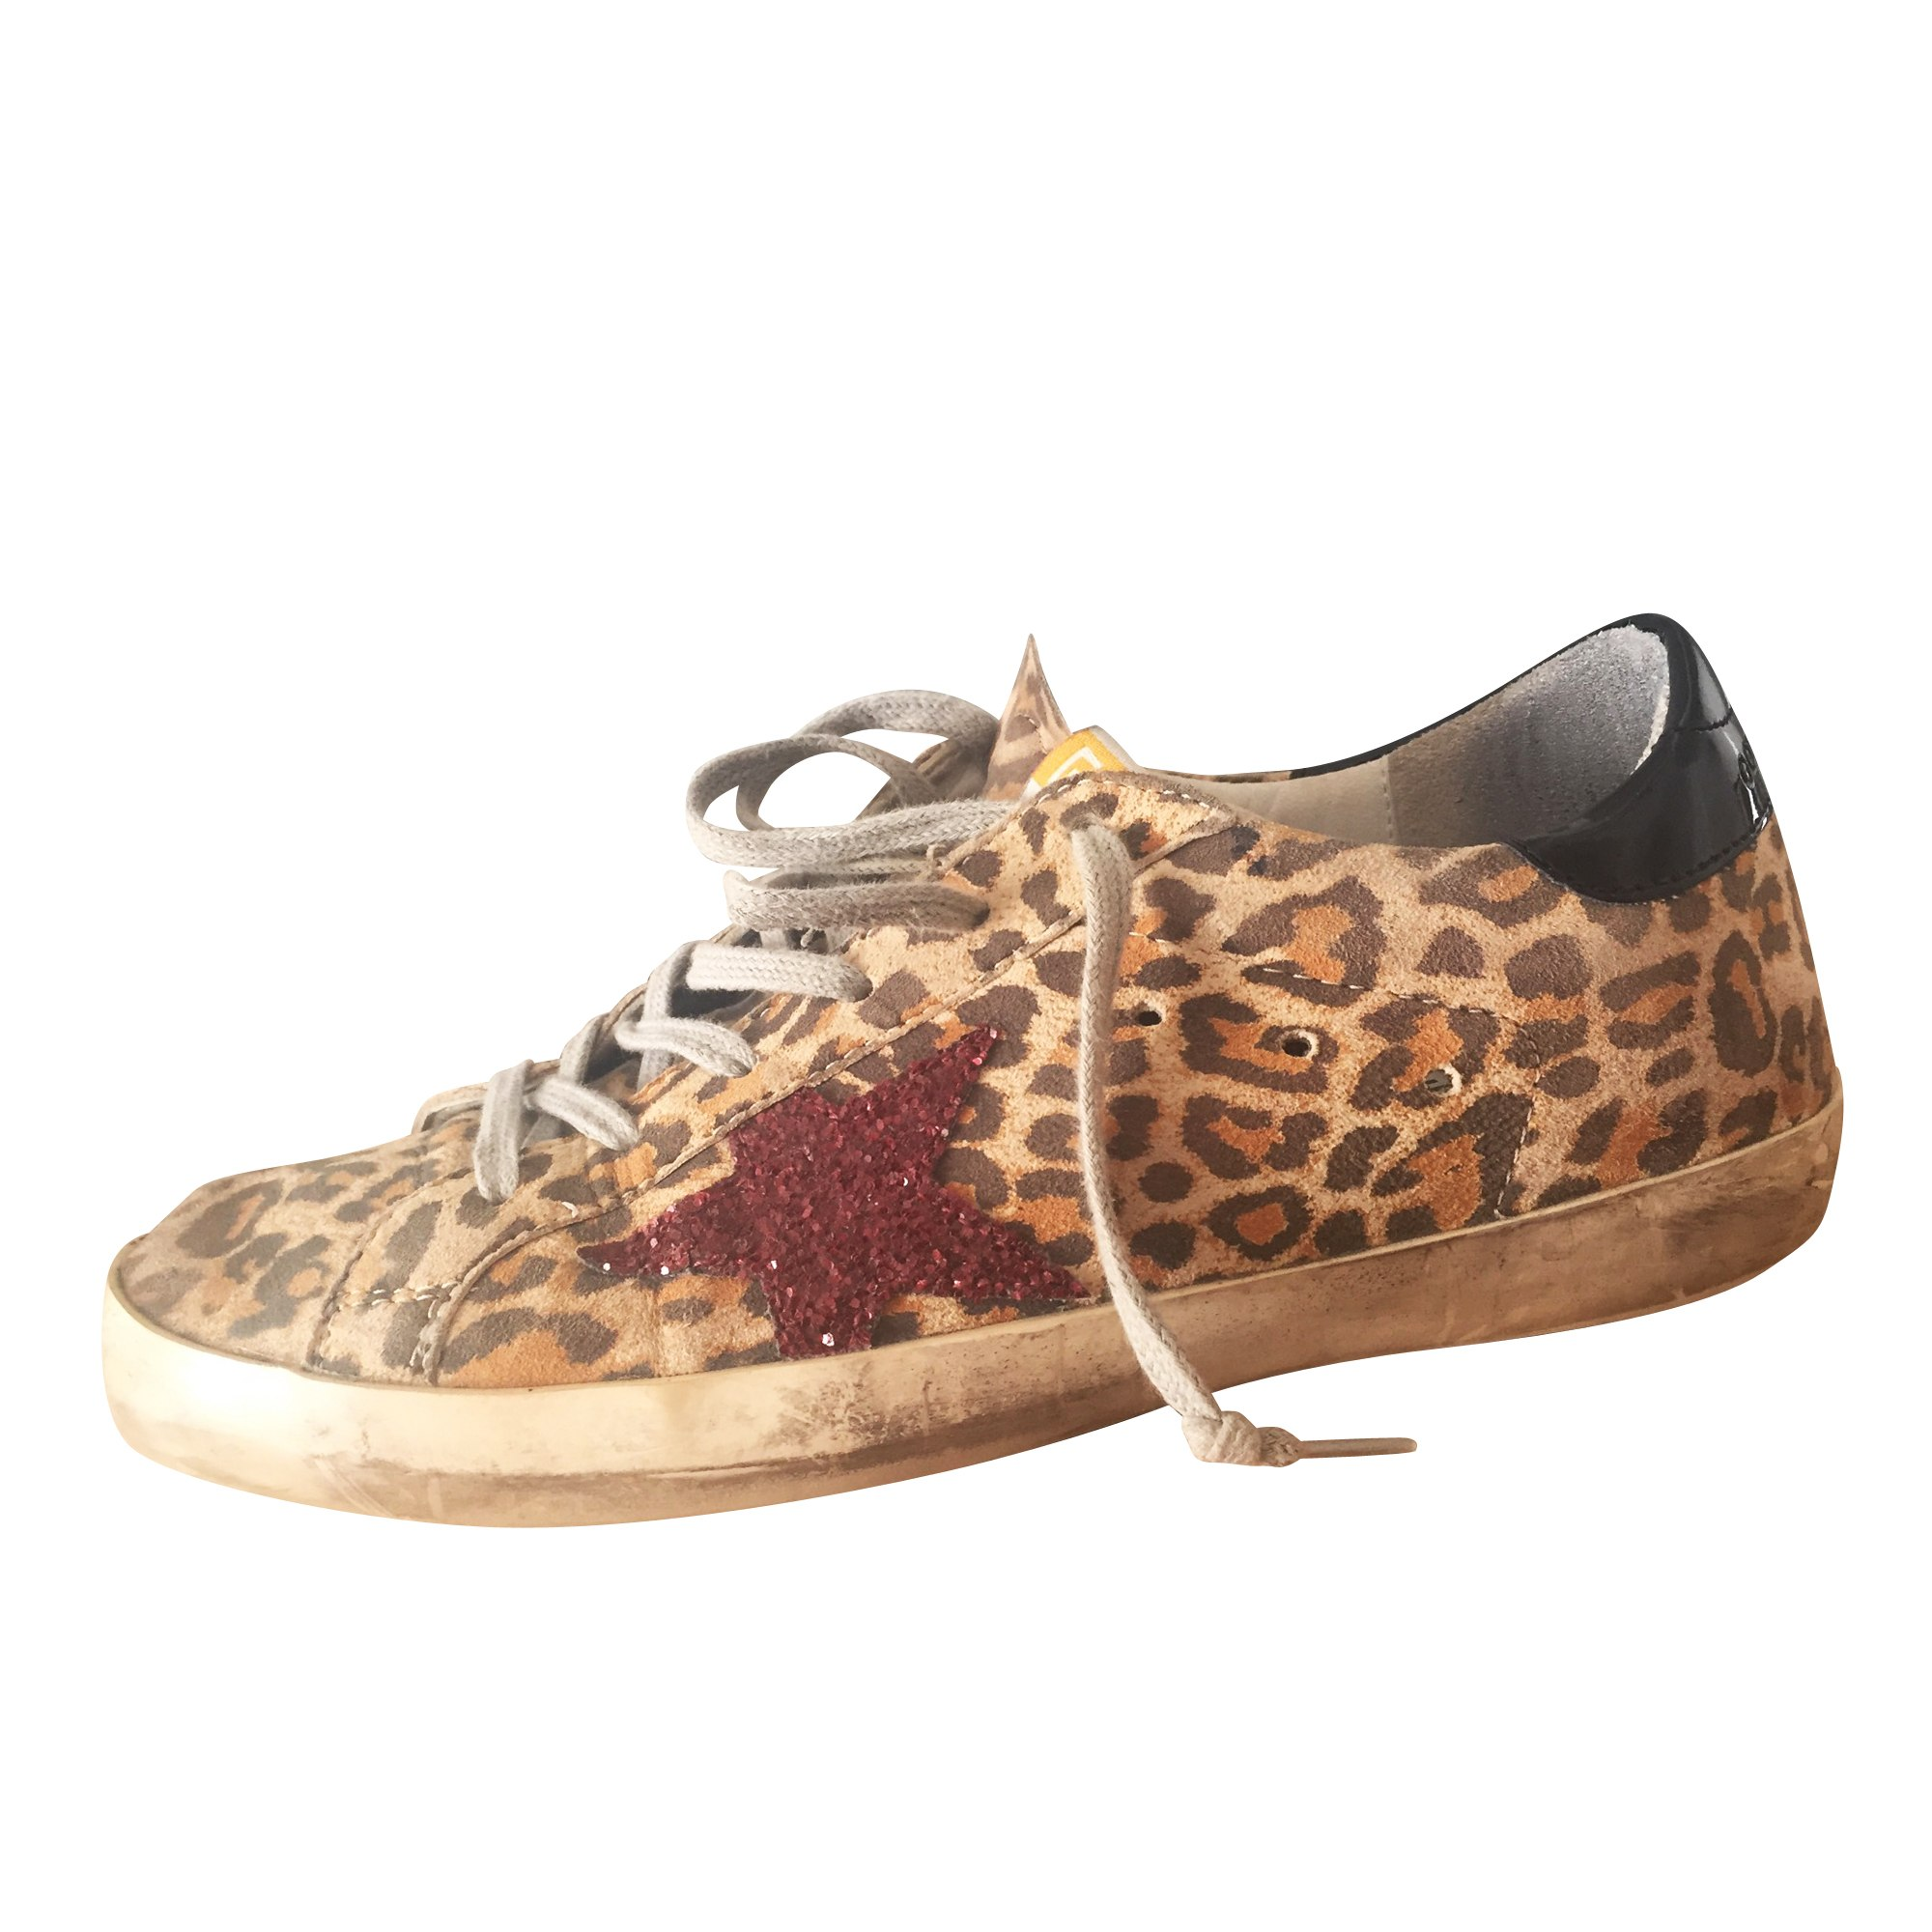 Sneakers GOLDEN GOOSE Animal prints